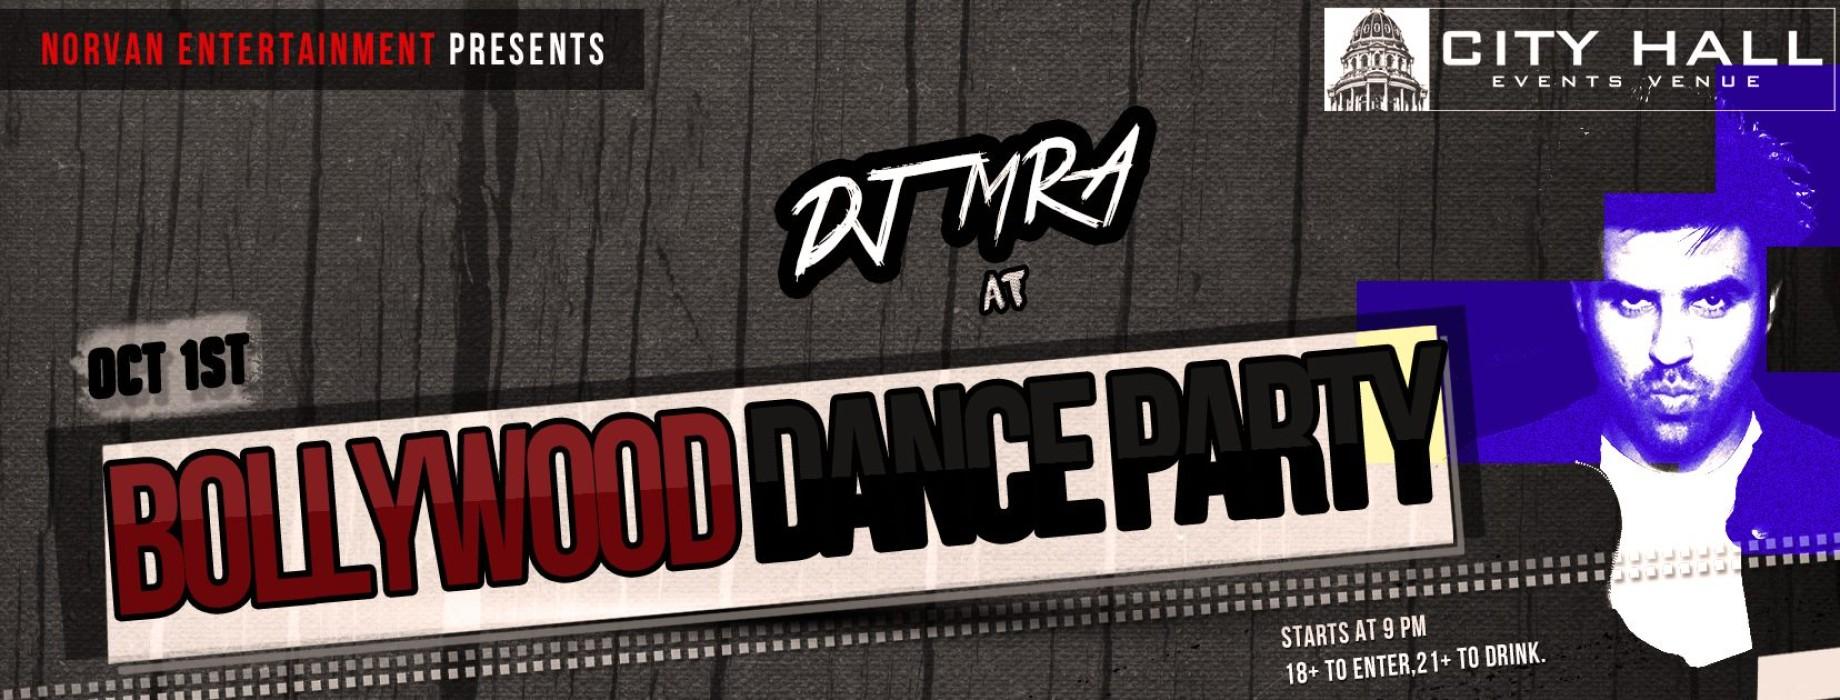 Bollywood Dance Party 2016 Denver